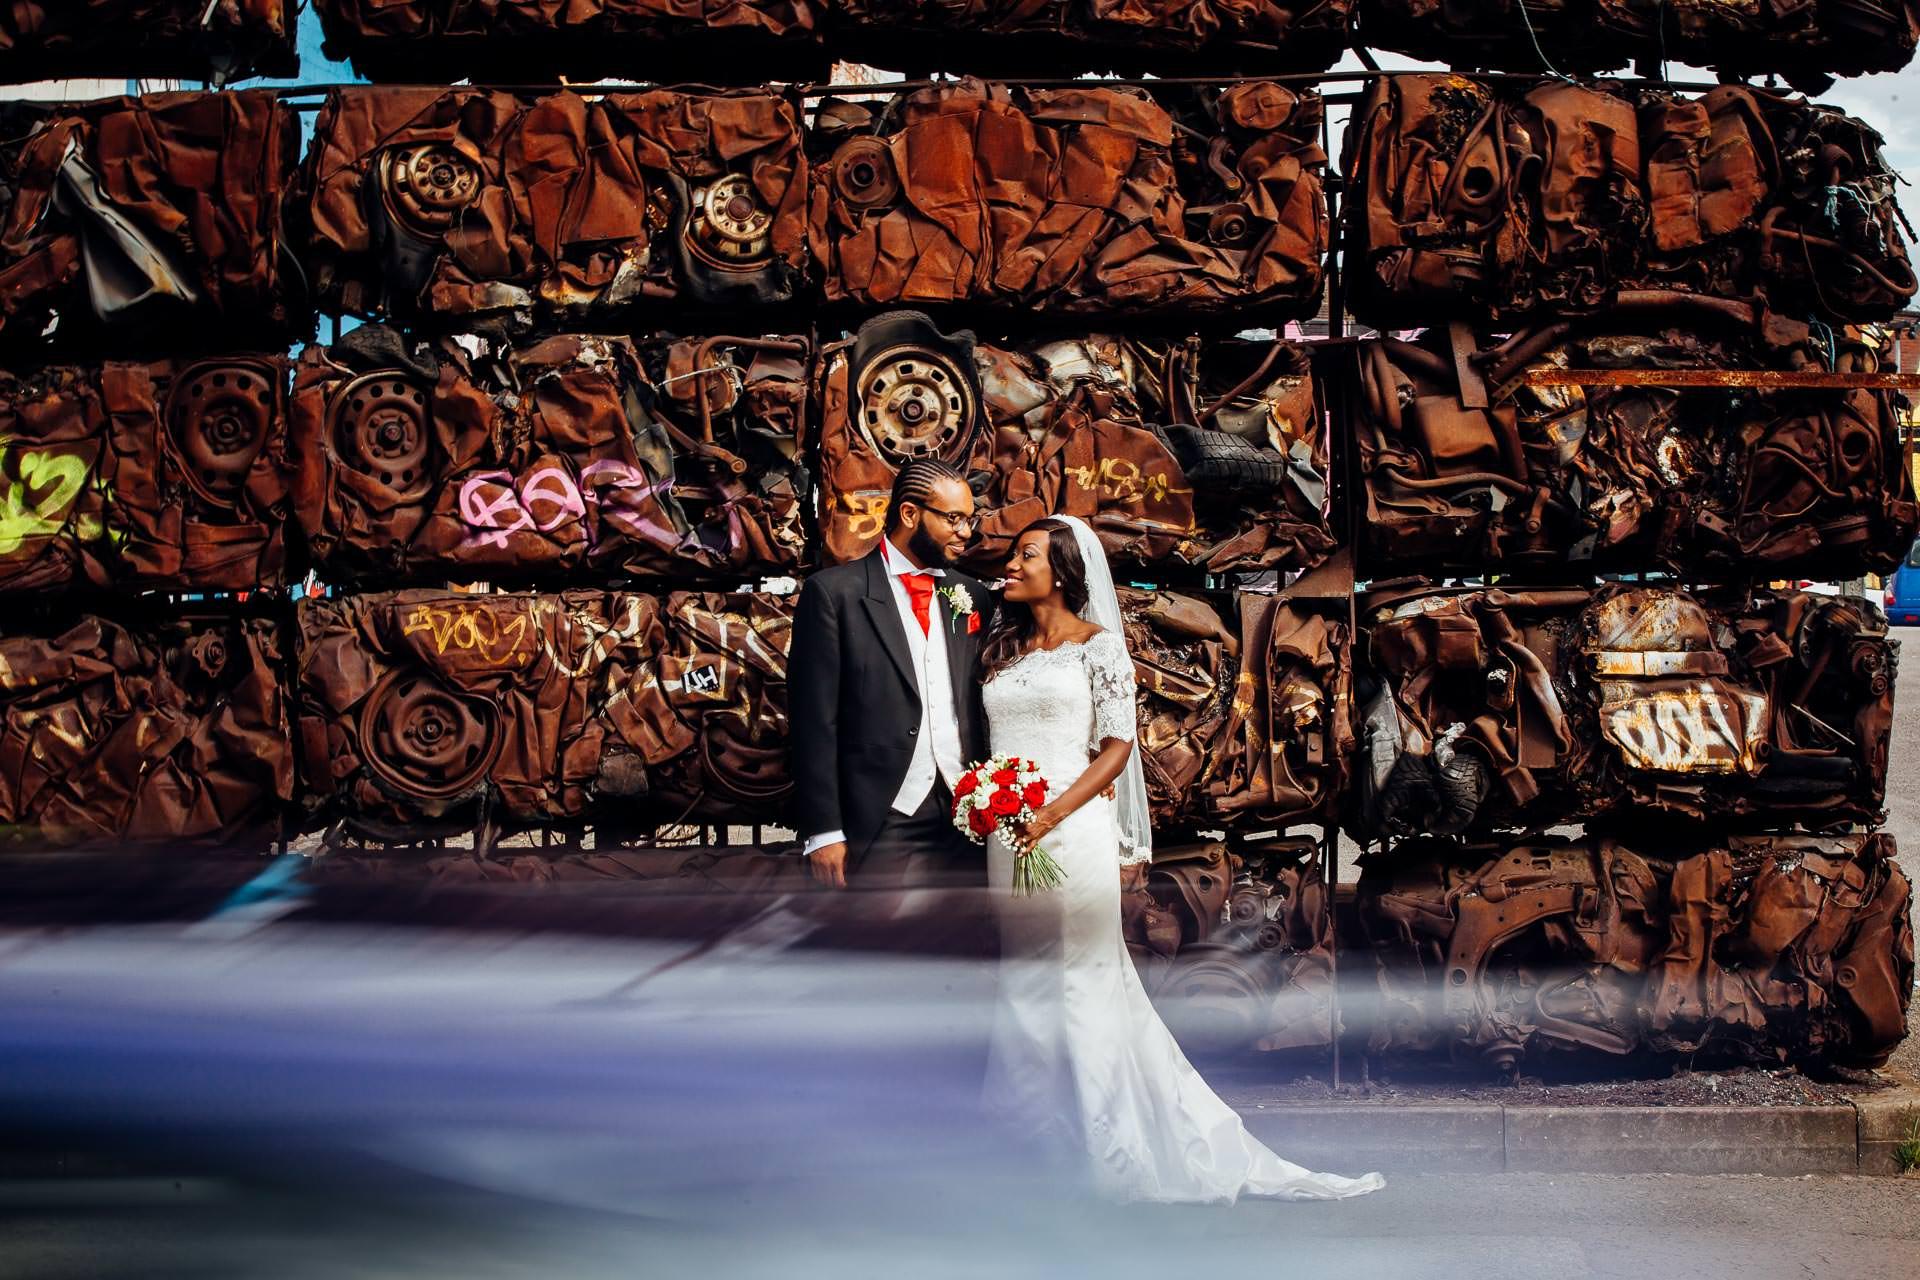 Custard Factory Birmingham wedding photograph